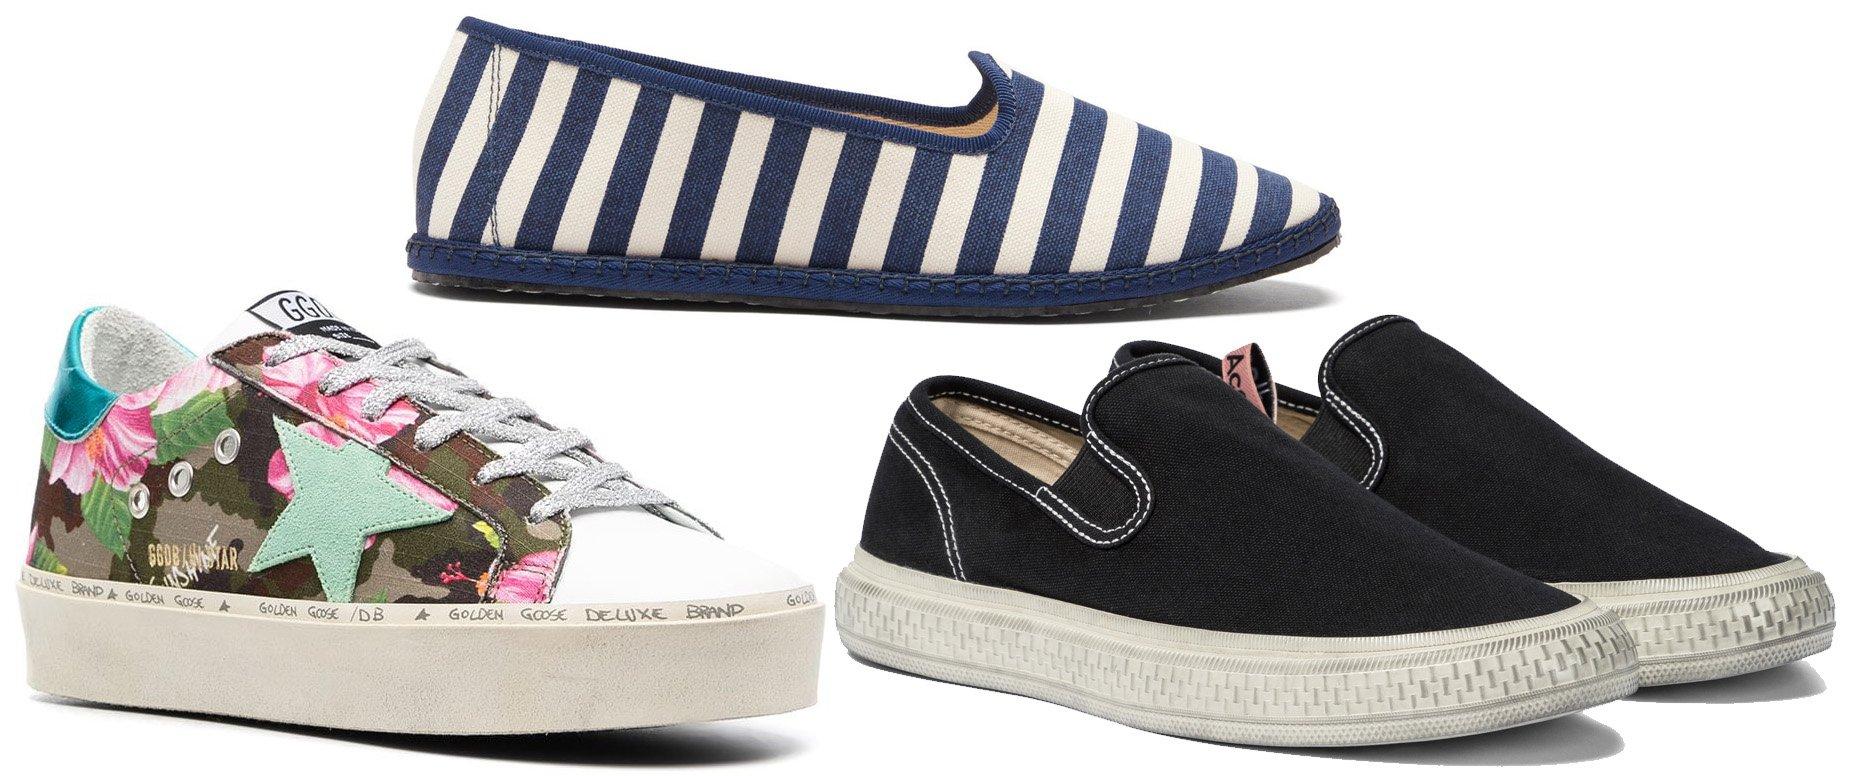 Golden Goose Superstar canvas sneakers, Vibi Venezia Gondola striped canvas flats, Acne Studios Canvas slip-on sneakers